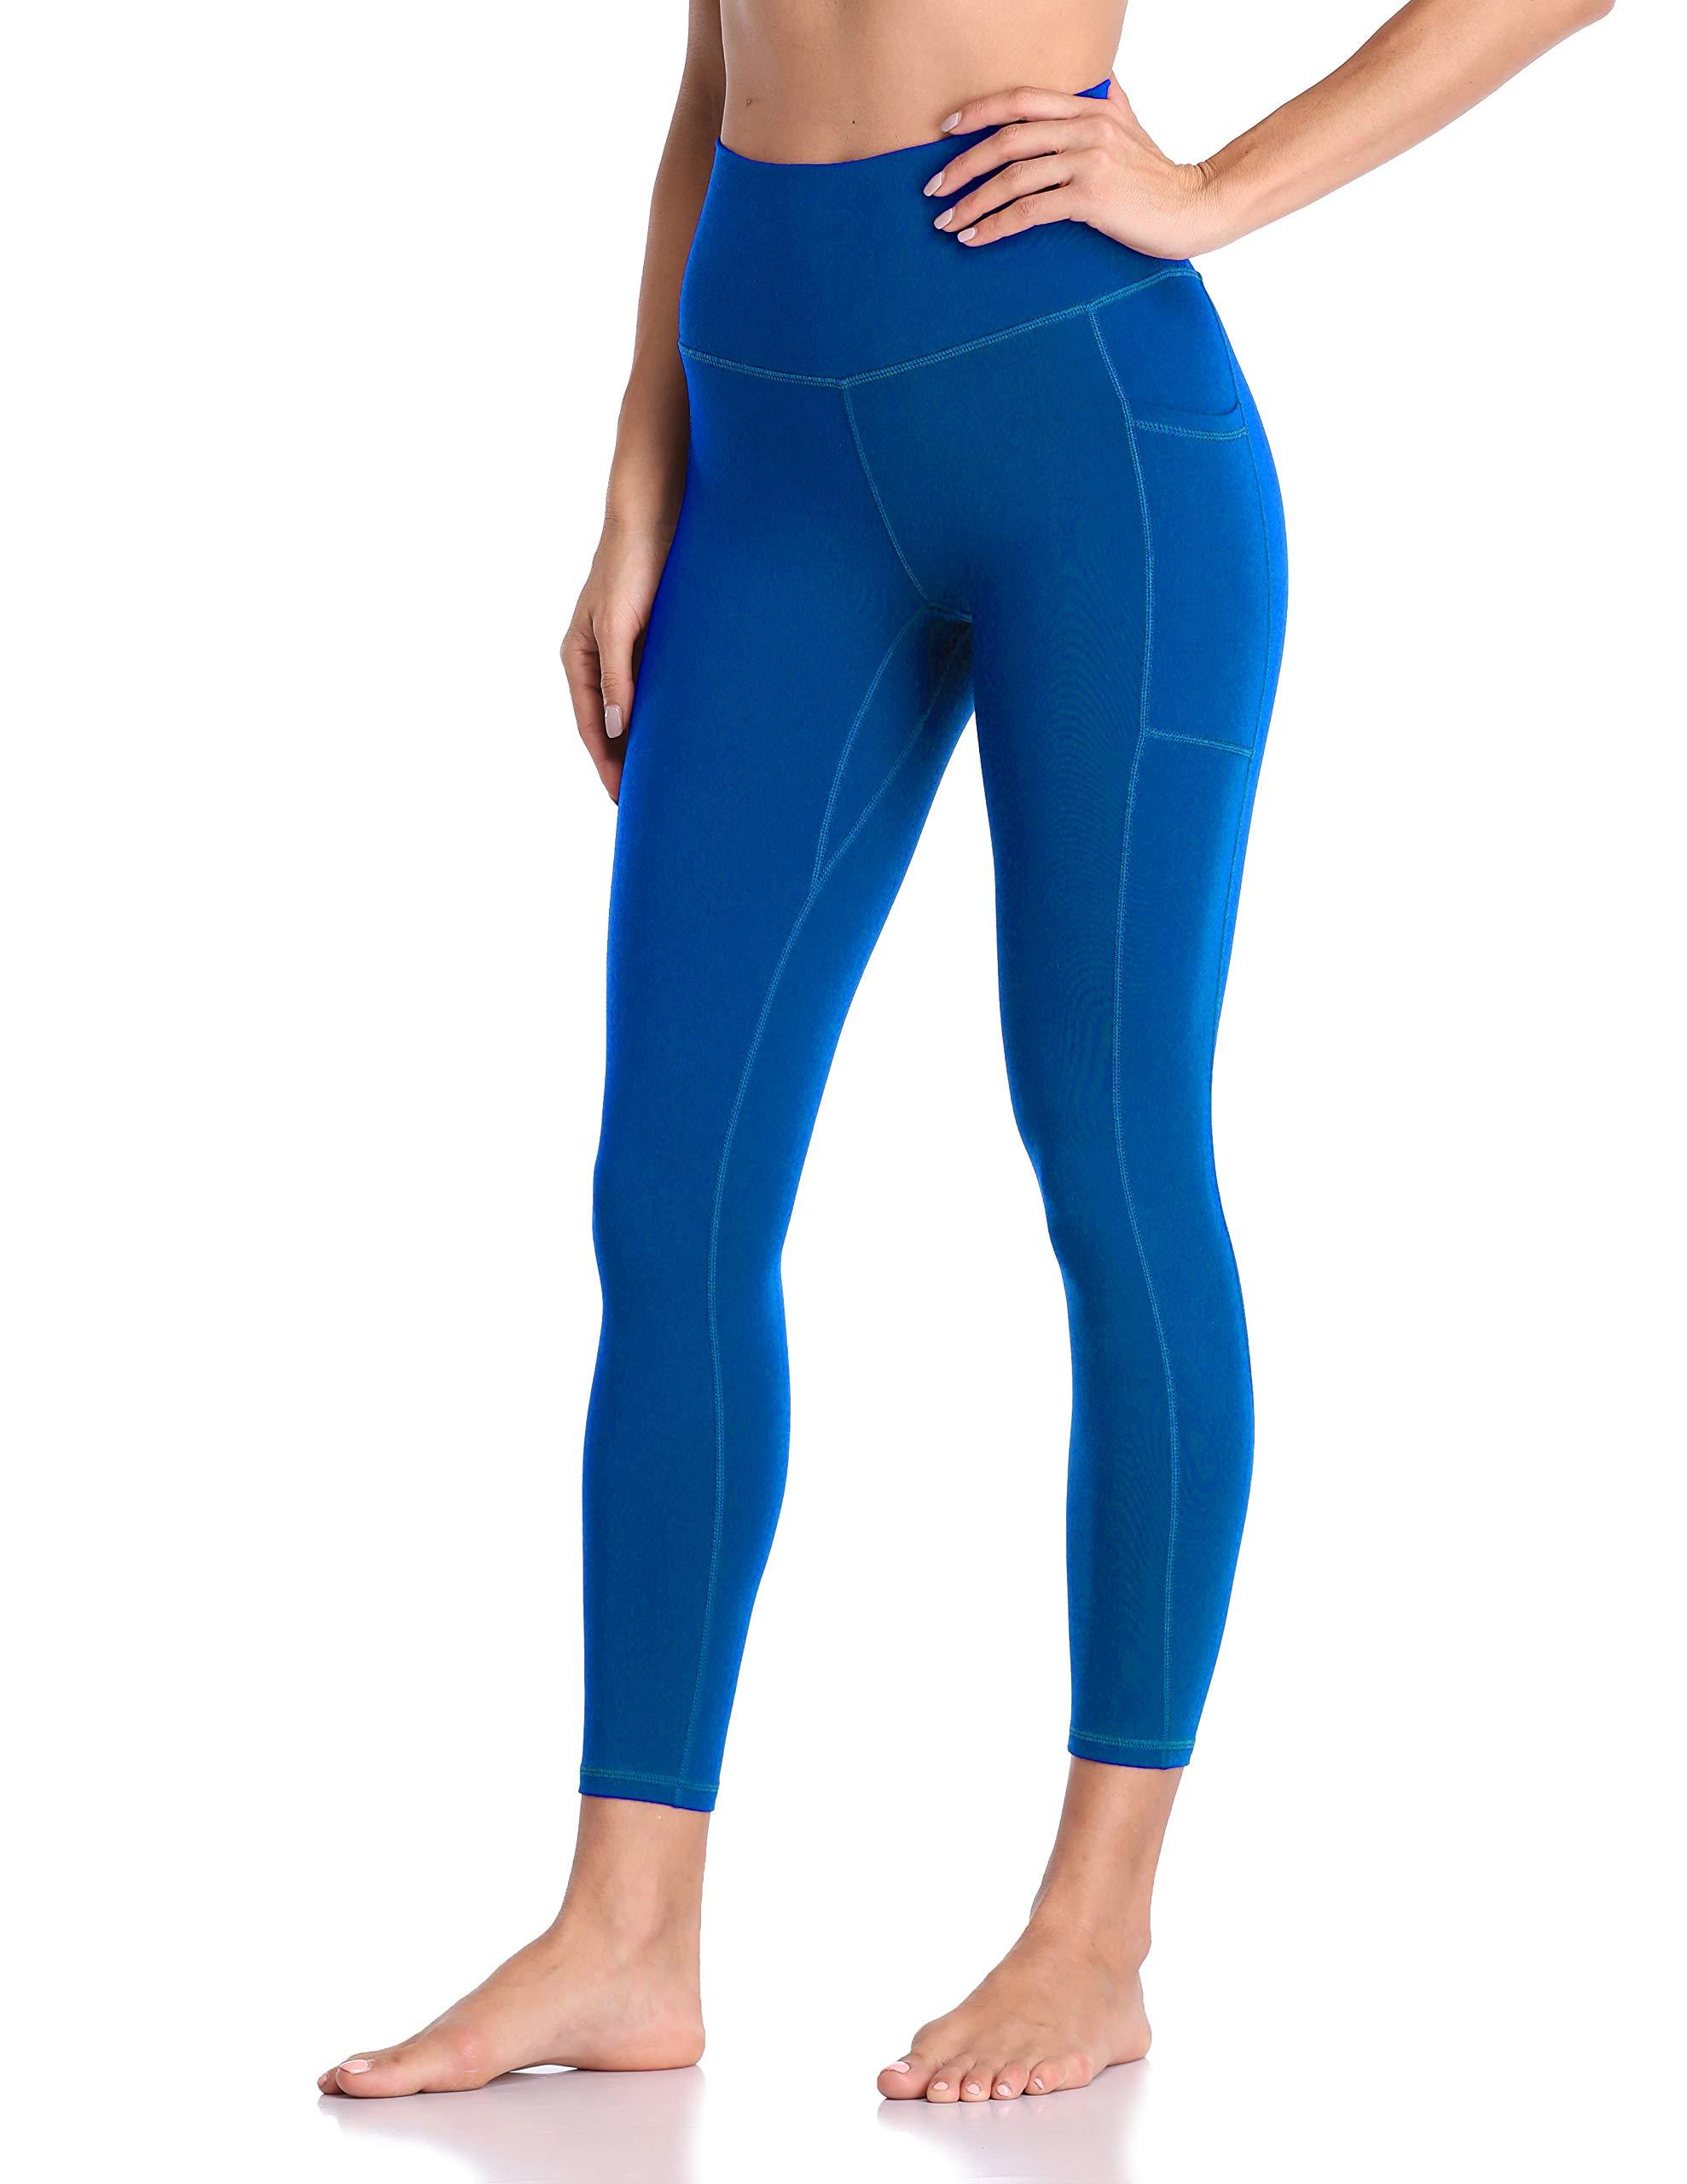 Colorfulkoala Women's High Waisted Yoga Pants 7/8 Length Leggings with Pockets (XS, Sapphire Blue) by Colorfulkoala